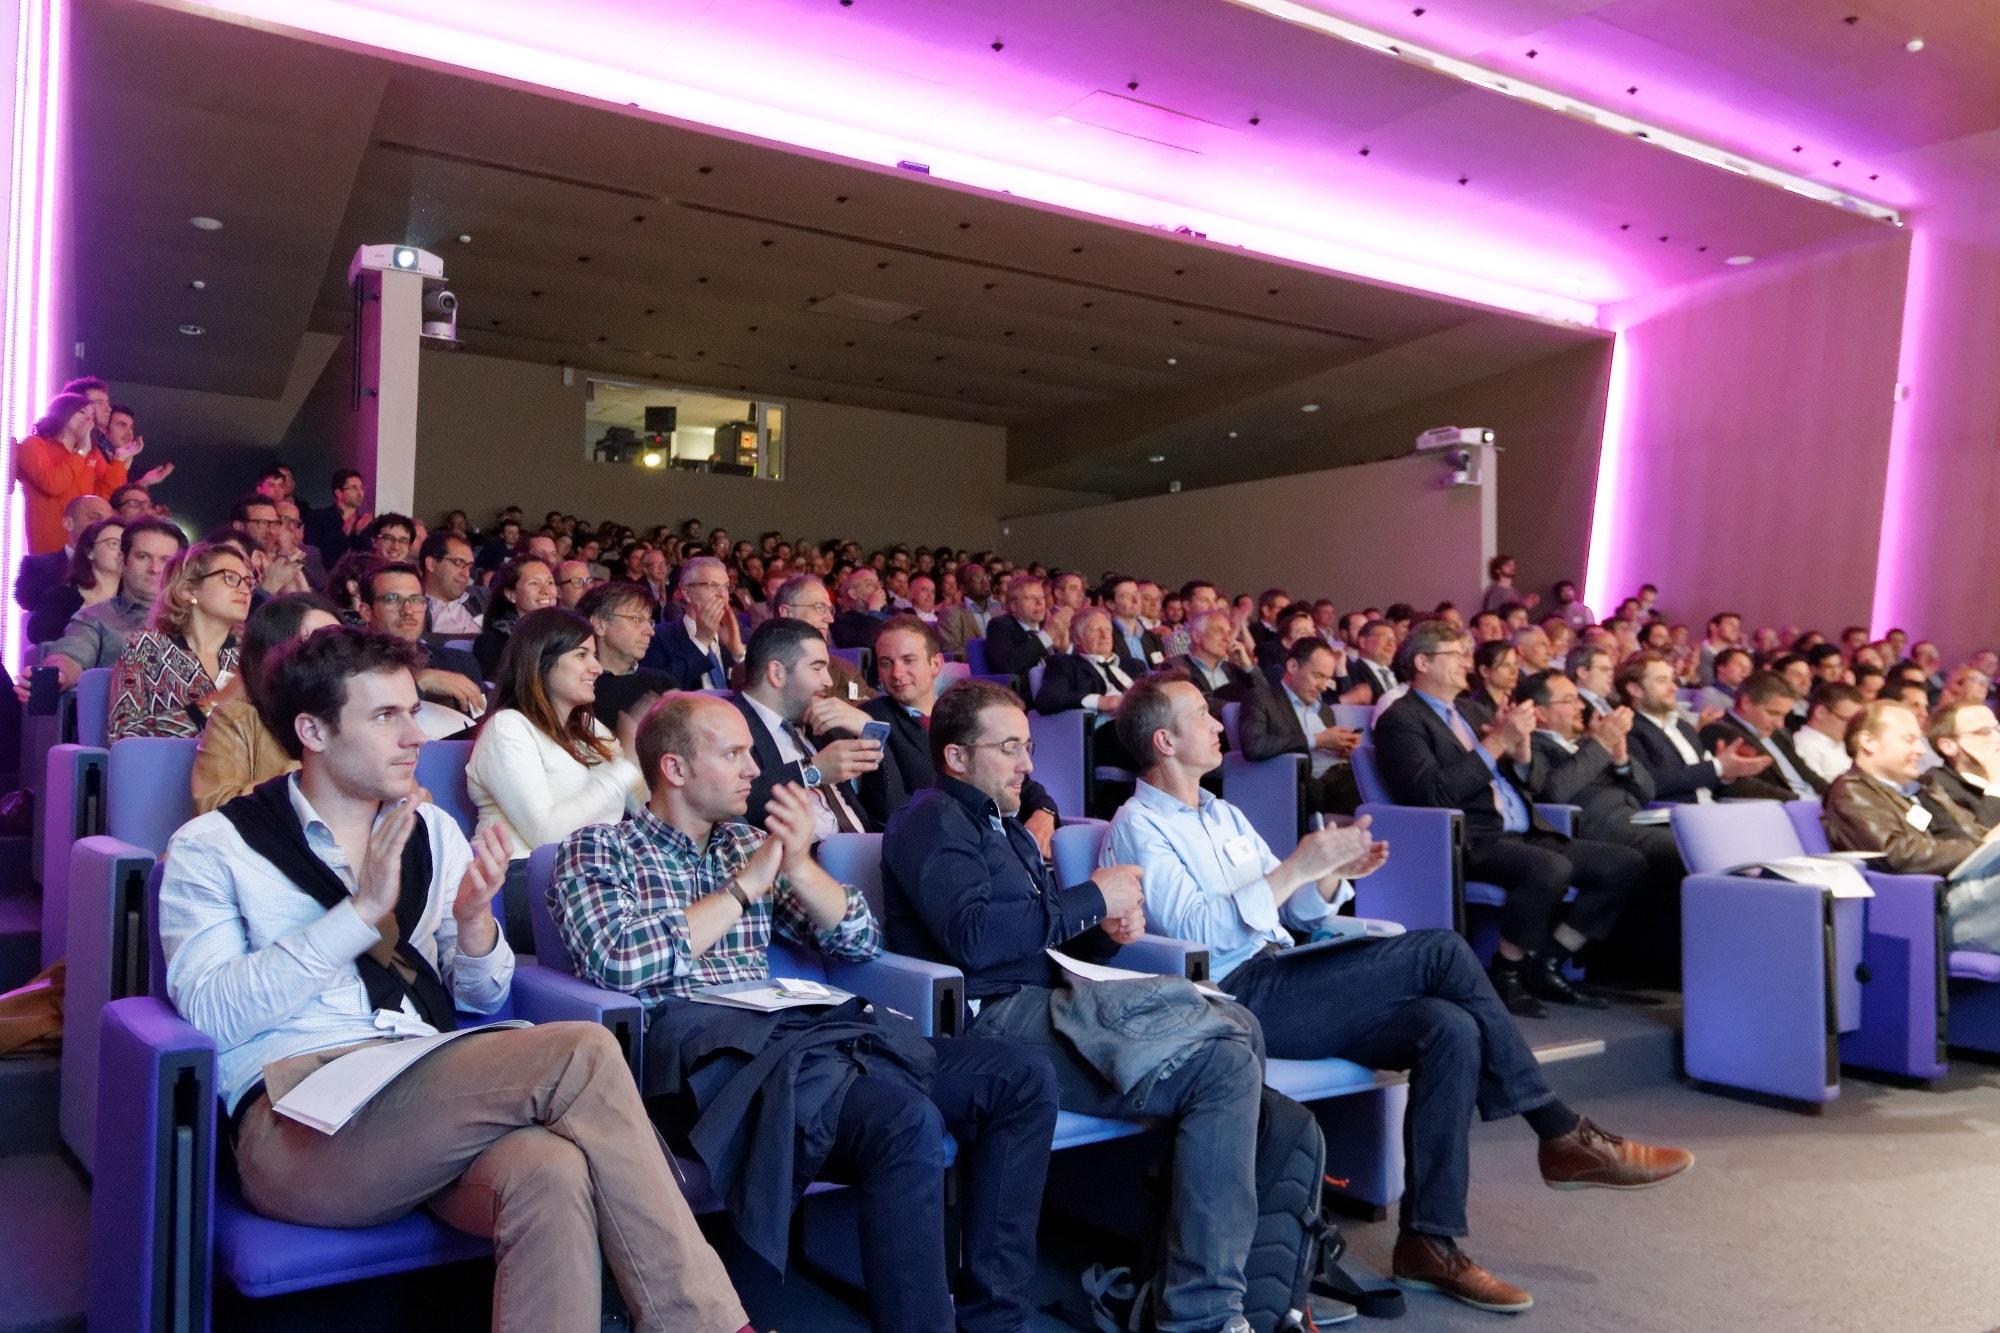 Apero Chantier Innovation #14 - conferences